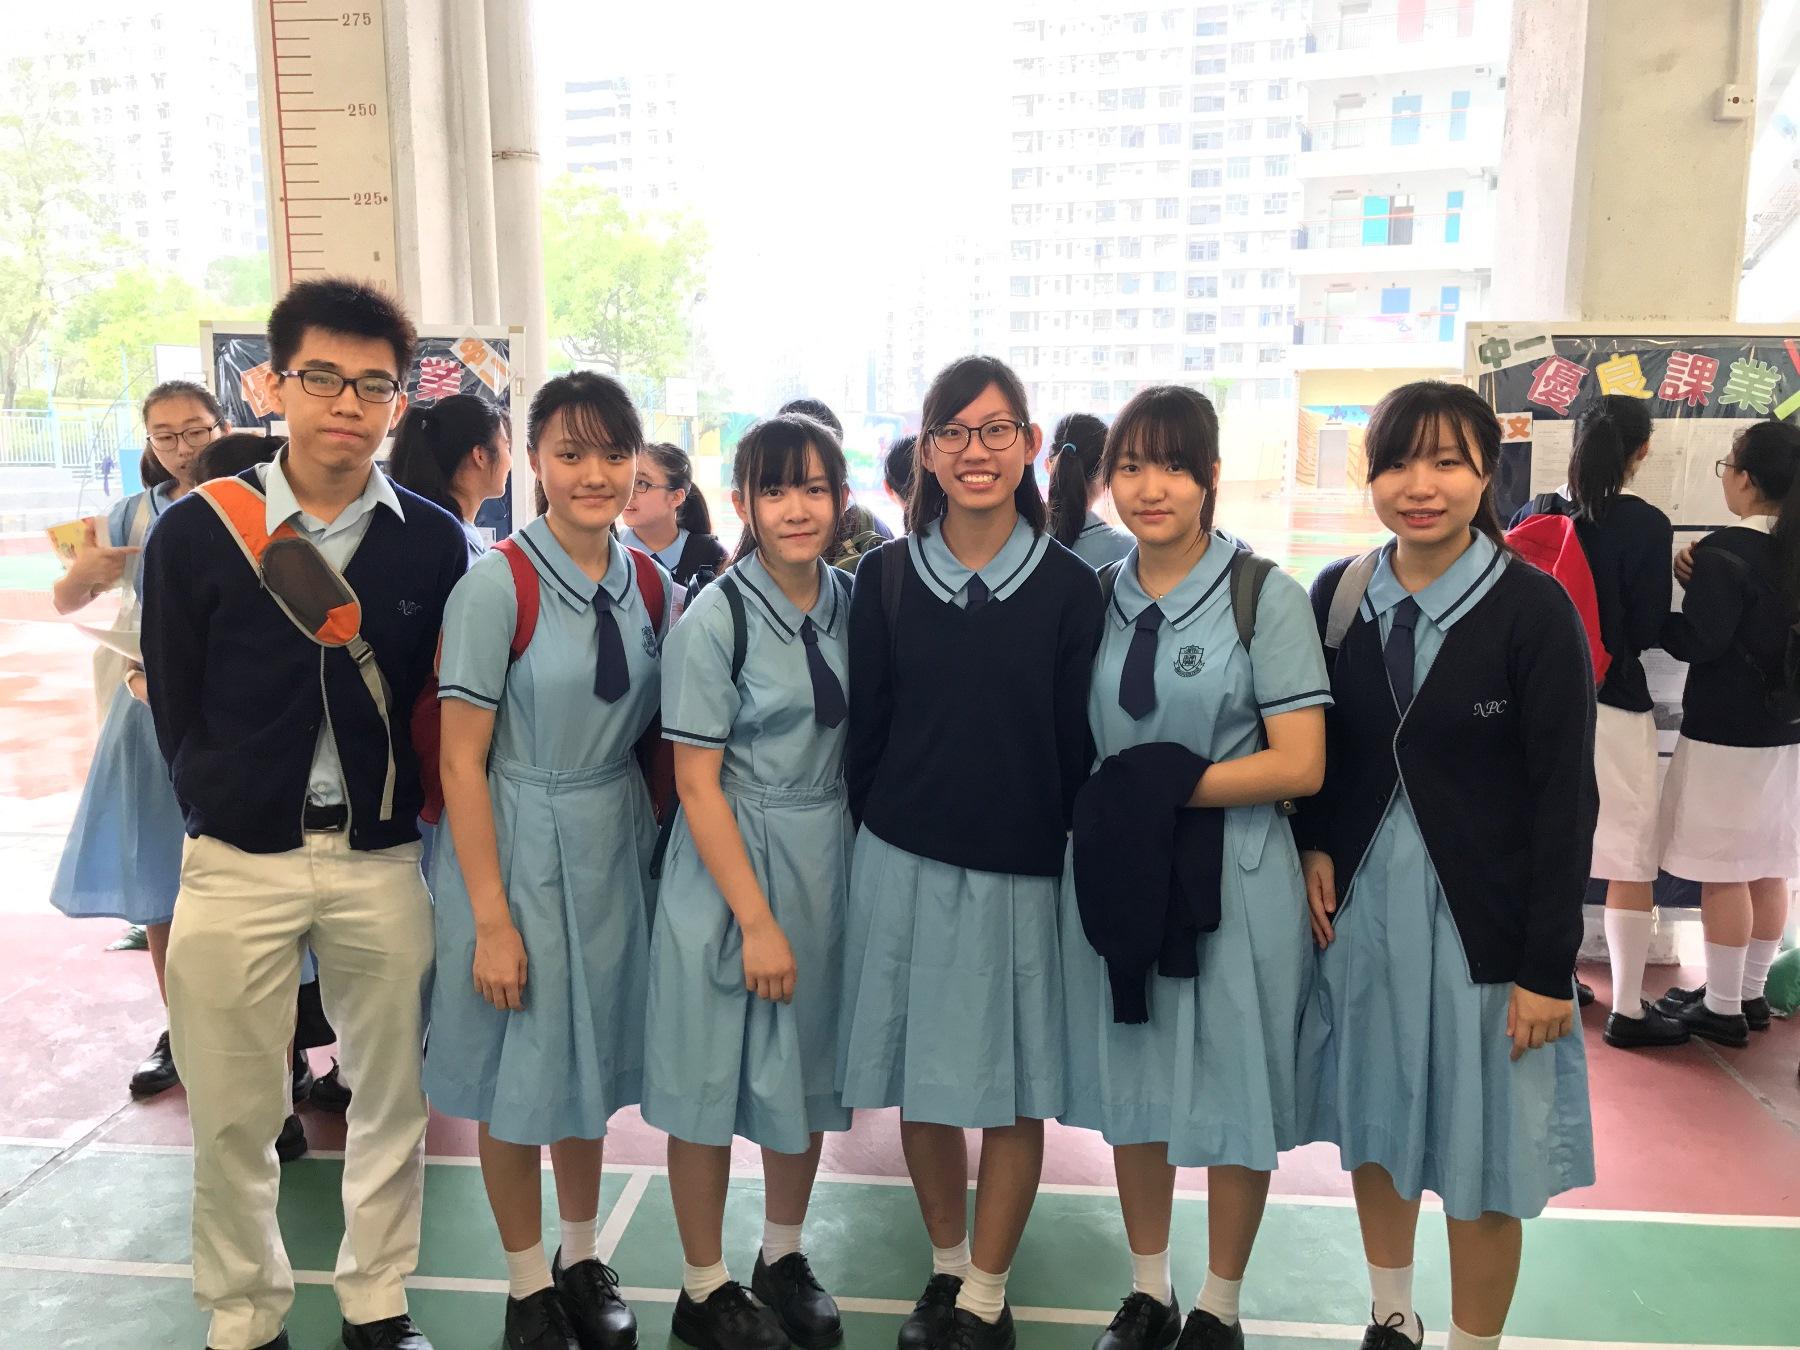 https://www.npc.edu.hk/sites/default/files/03_12.jpg